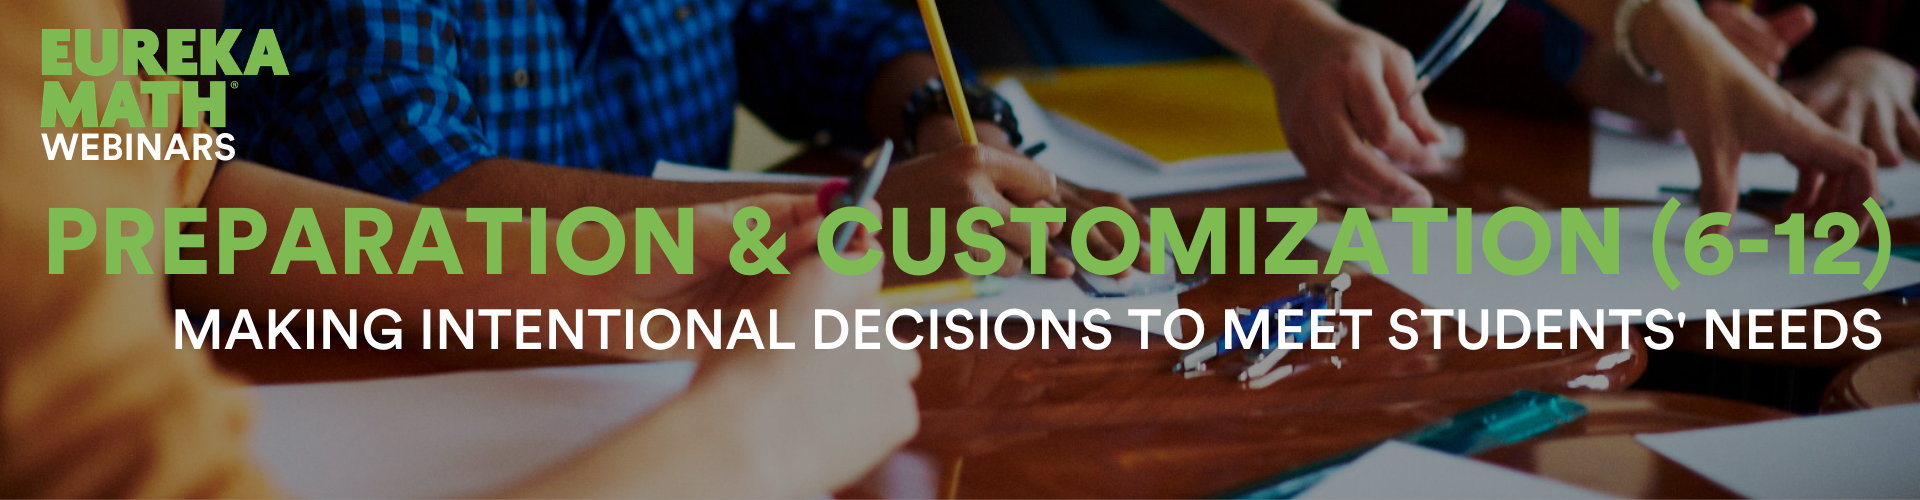 Prep & Customization Webinar - LP (3)